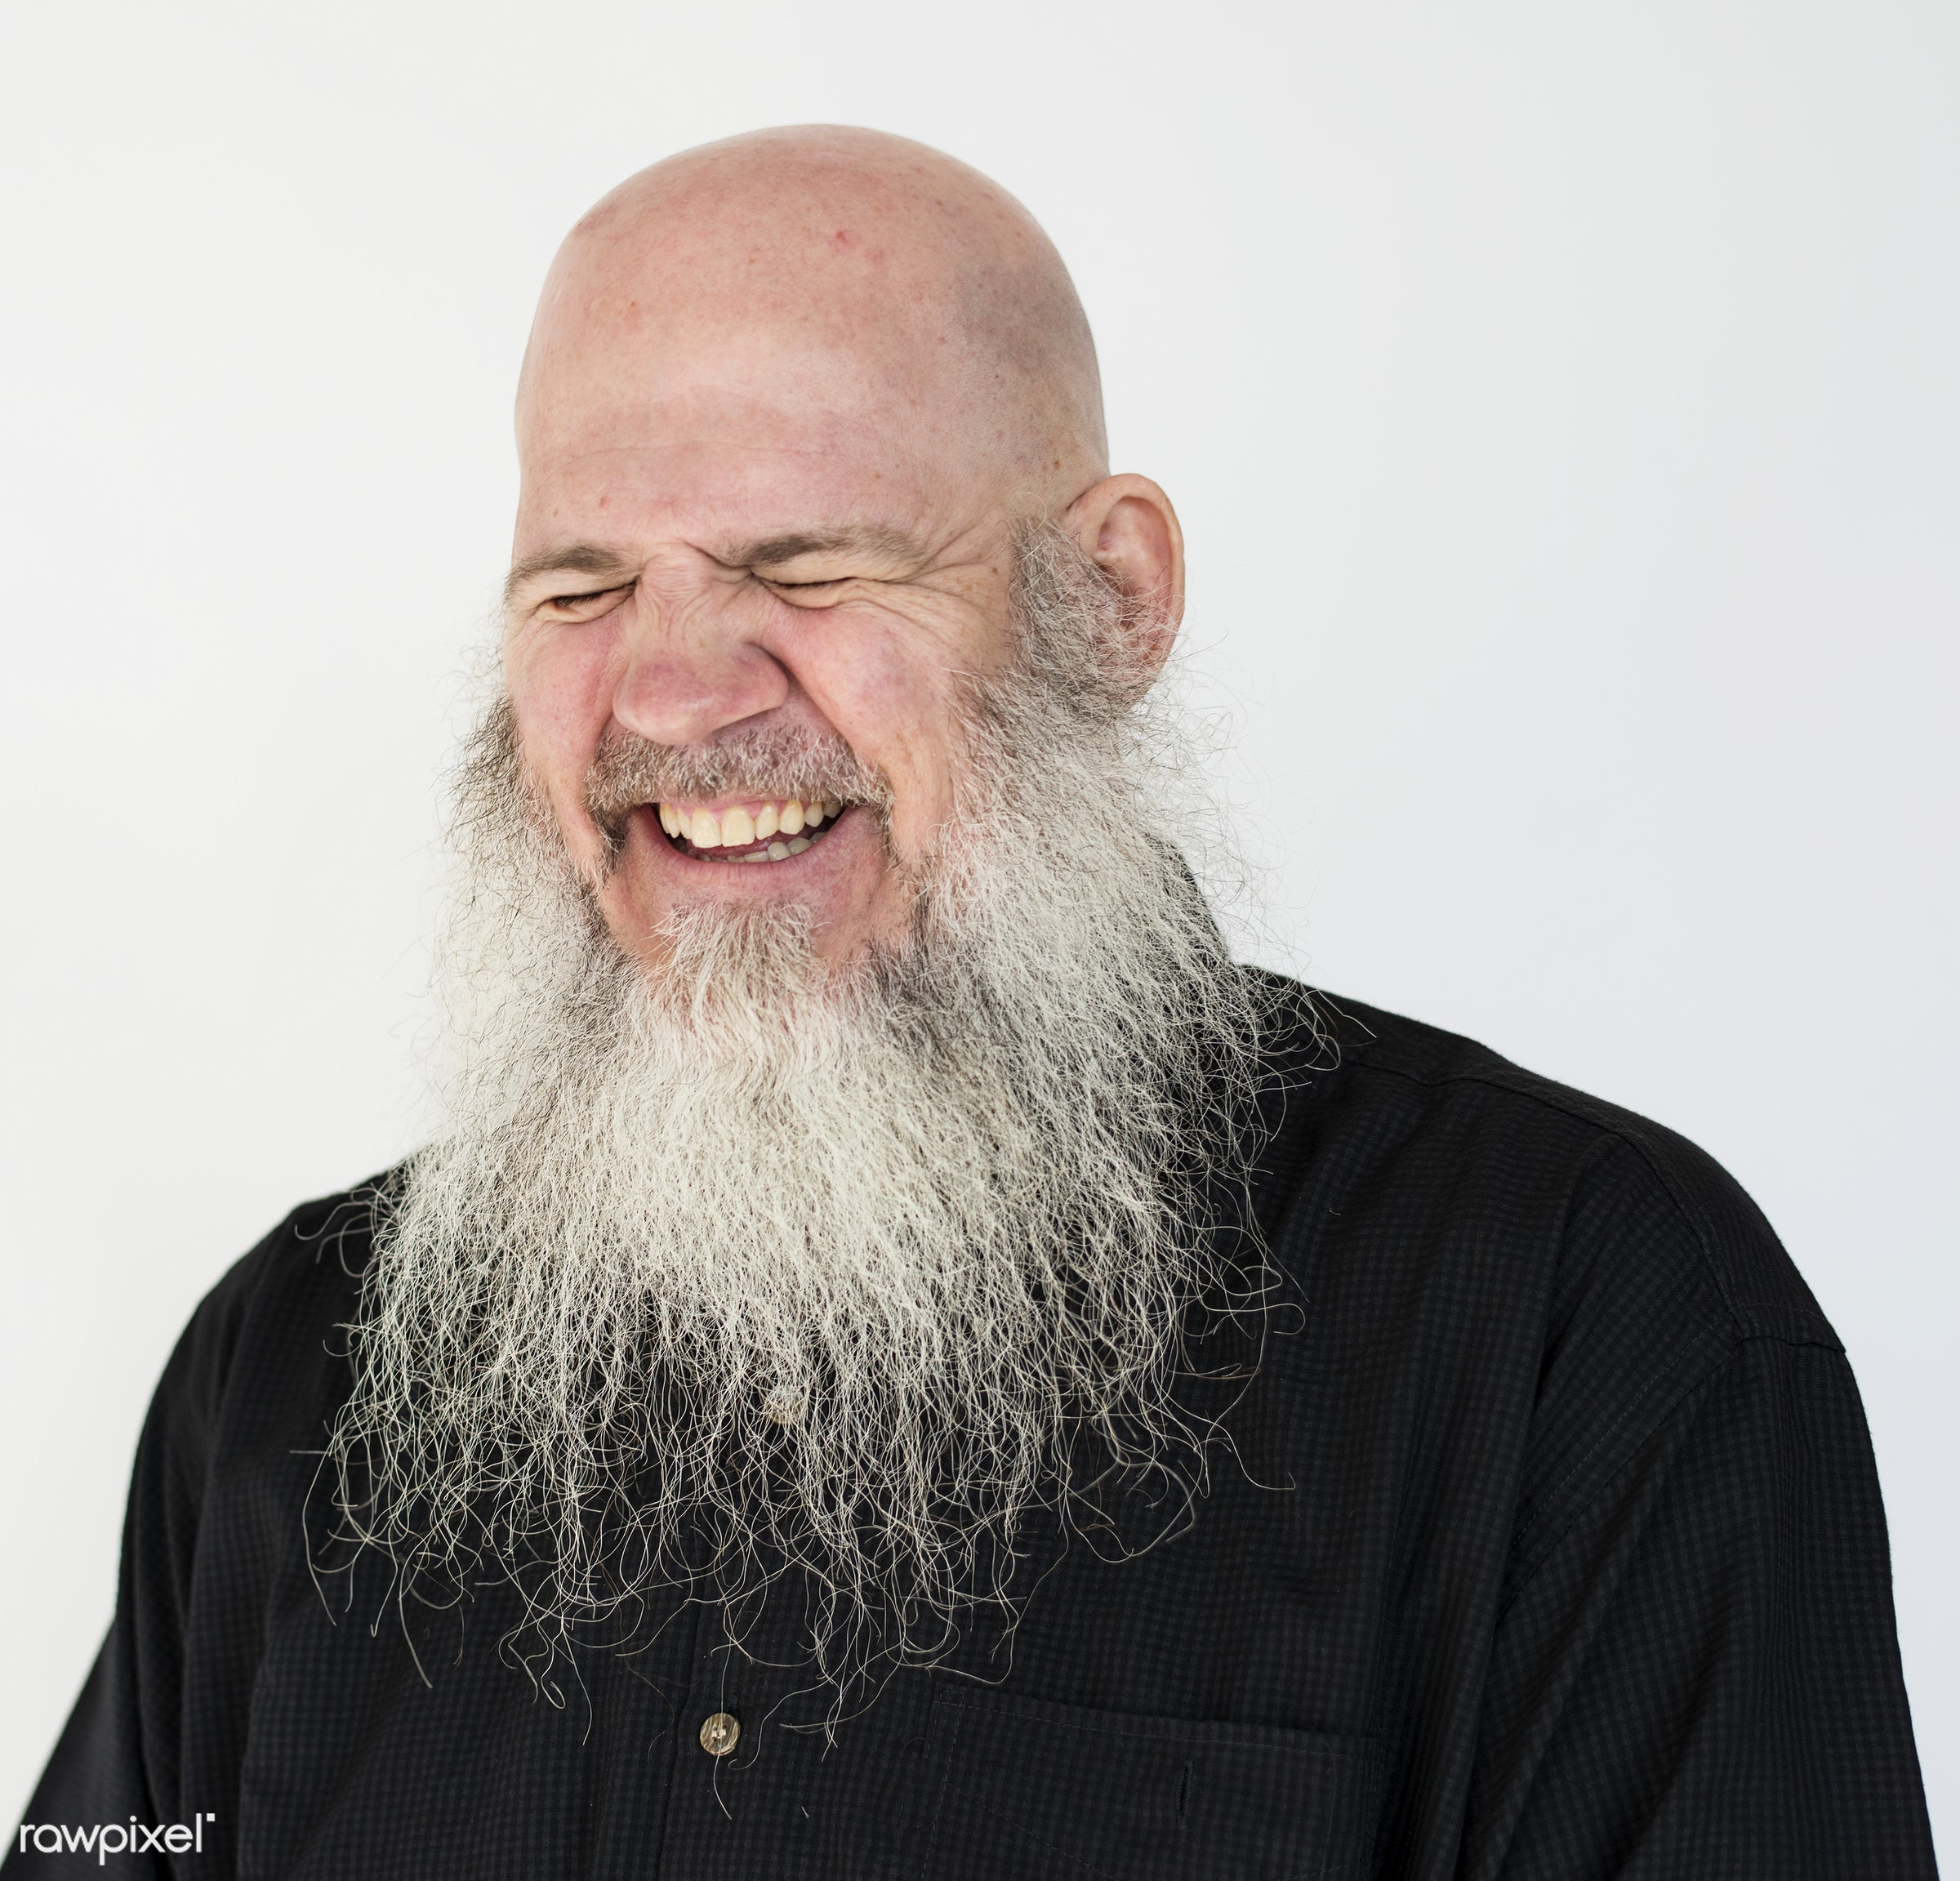 Portrait of a big bearded man - studio, person, model, concept, people, nature, style, stylish, men, smiling, closeup, man,...